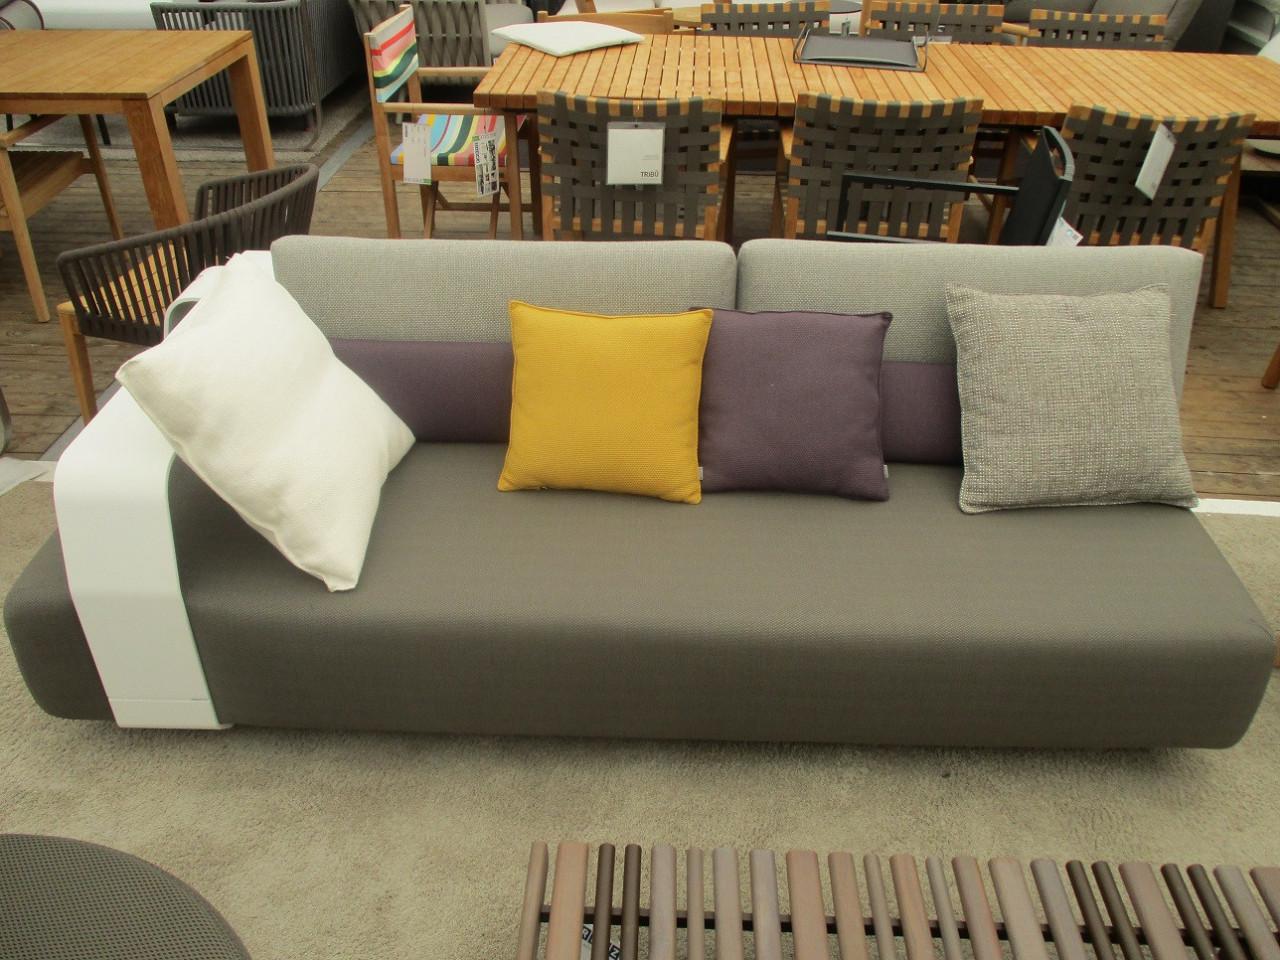 Garten Sofa/Liege Kumo Manutti weiß/braun Aluminium, Stoff ...